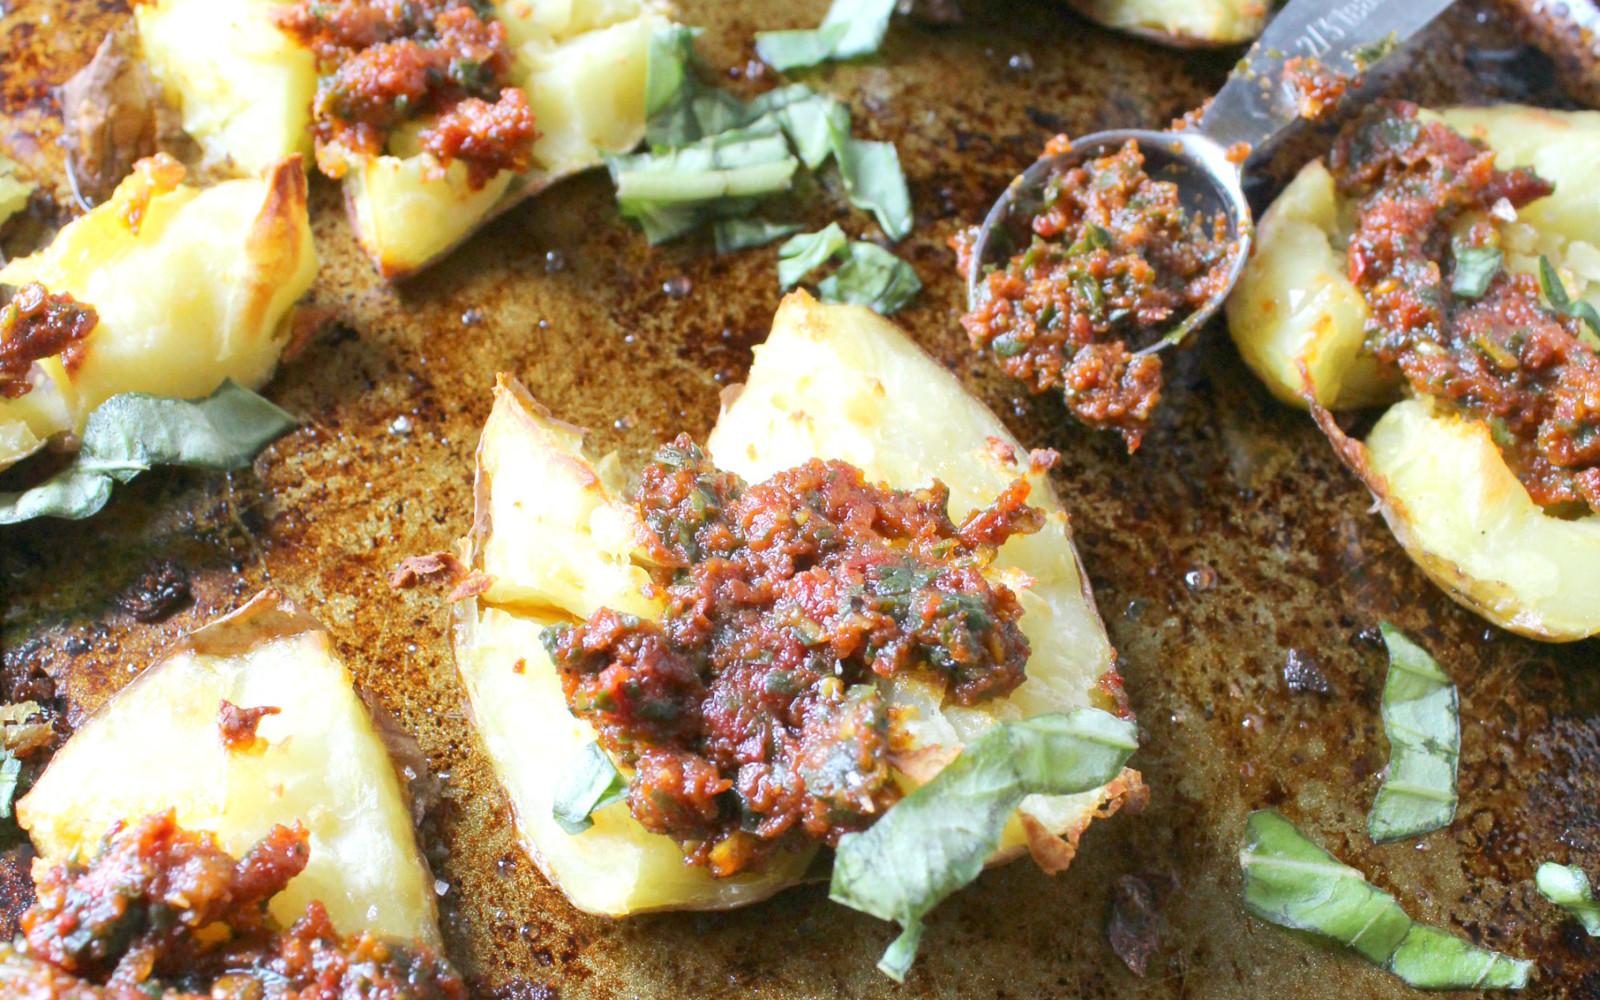 Vegan Grain-Free Smashed Potatoes With Sun-Dried Tomato Pesto